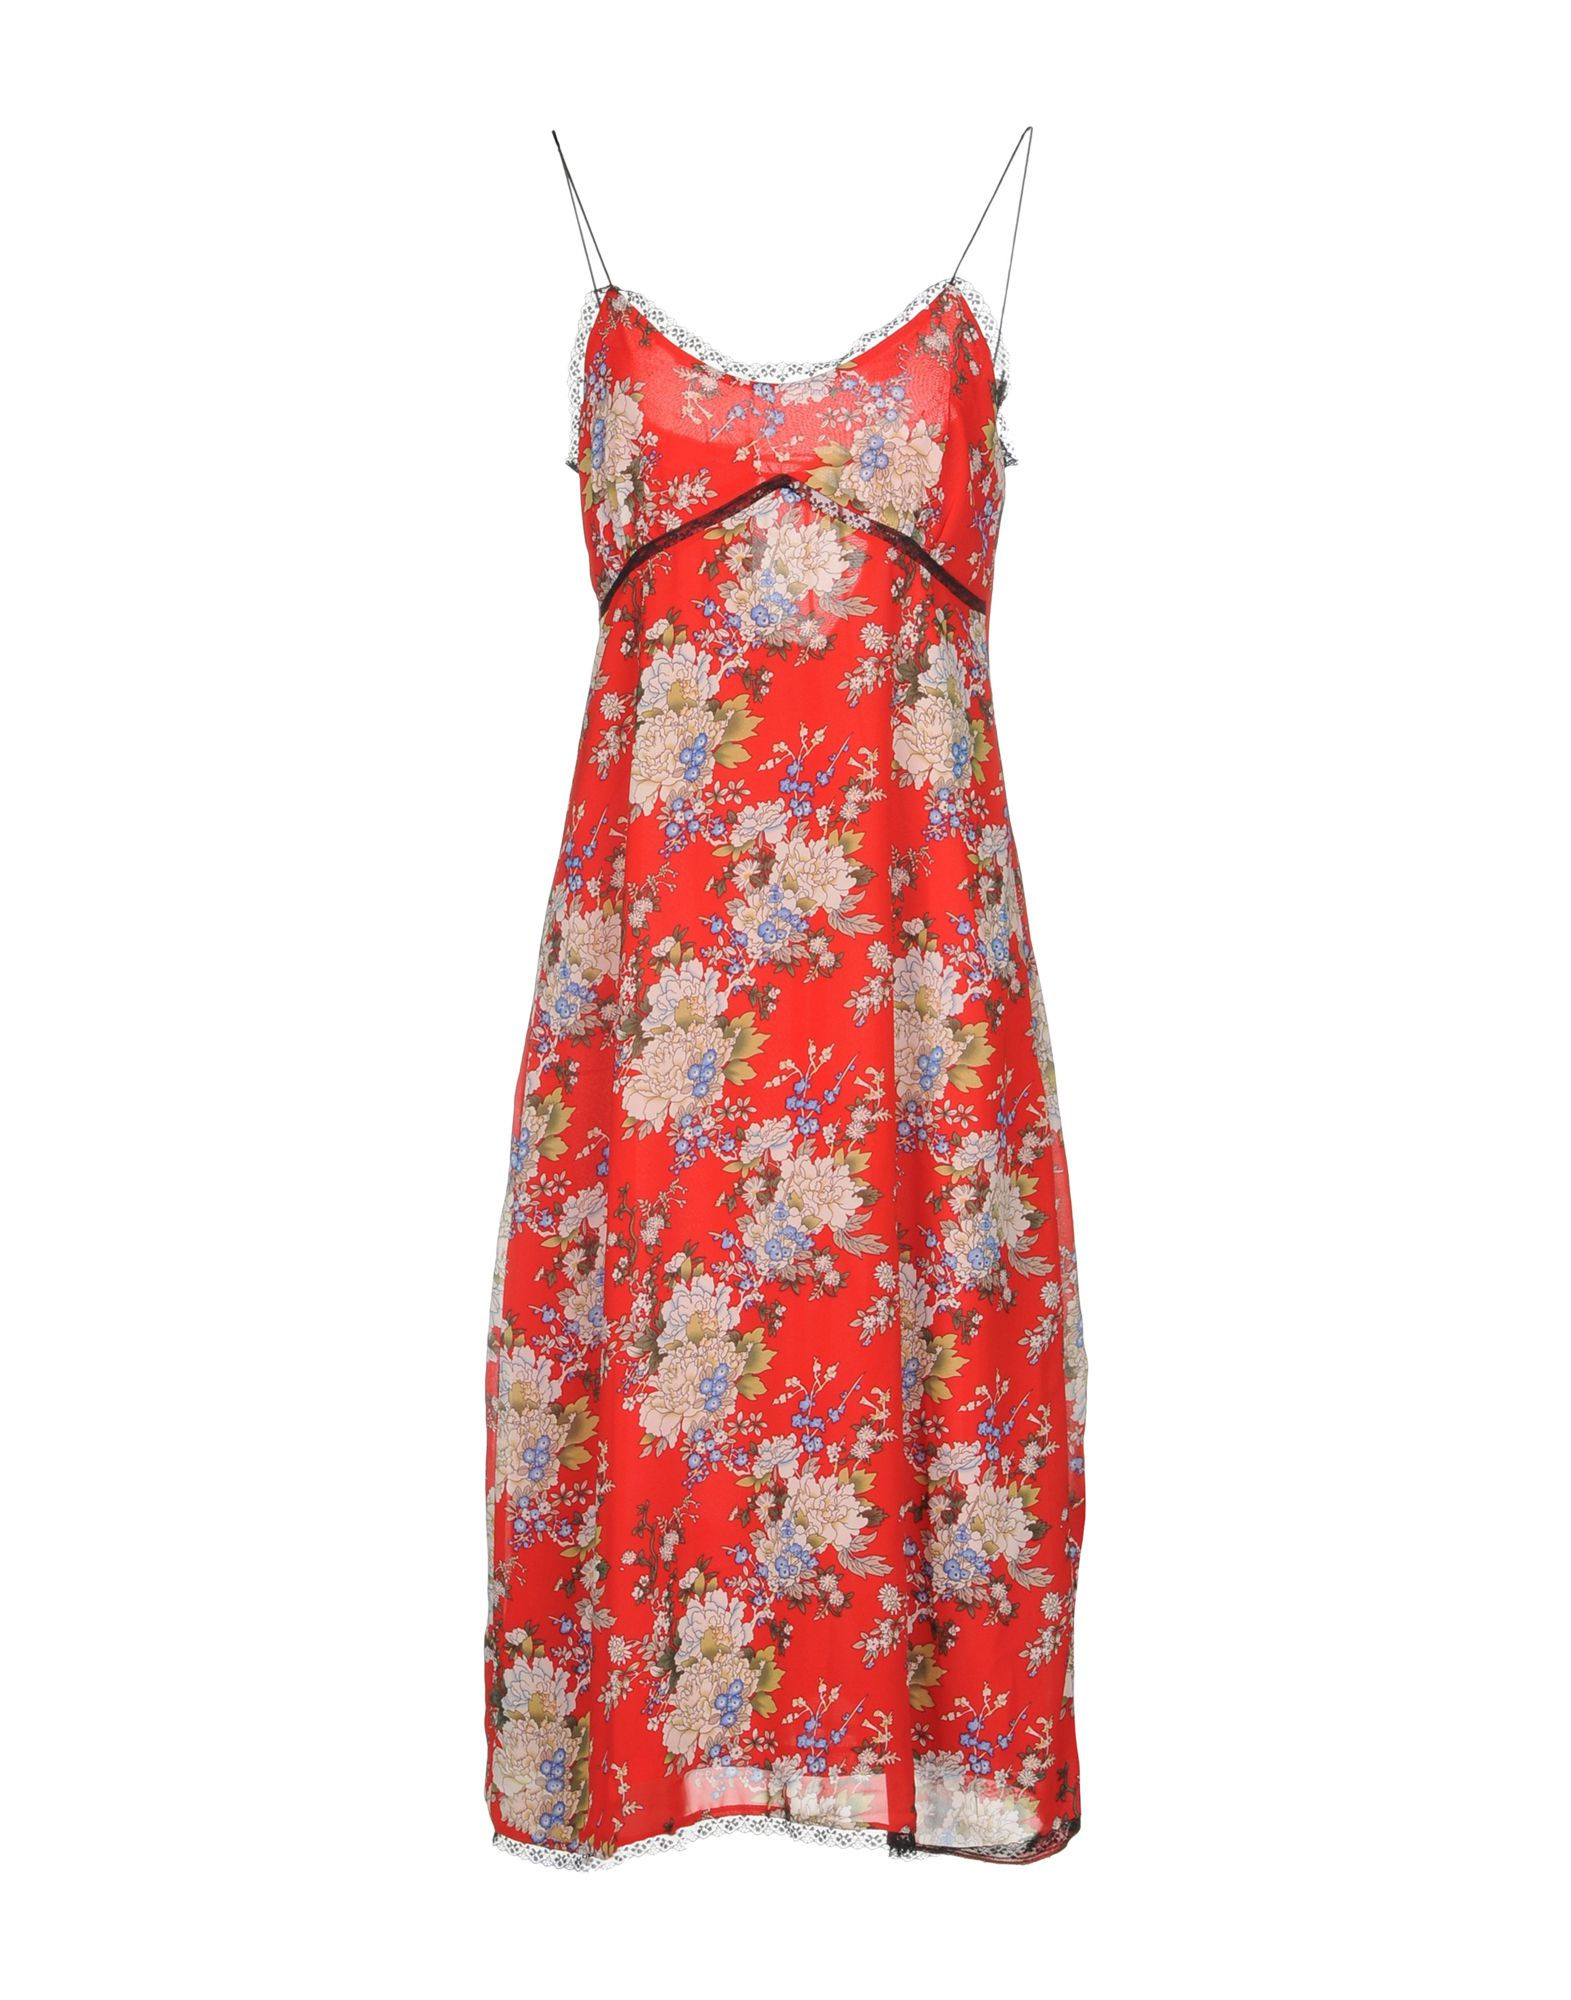 WYLDR Knee-Length Dress in Red